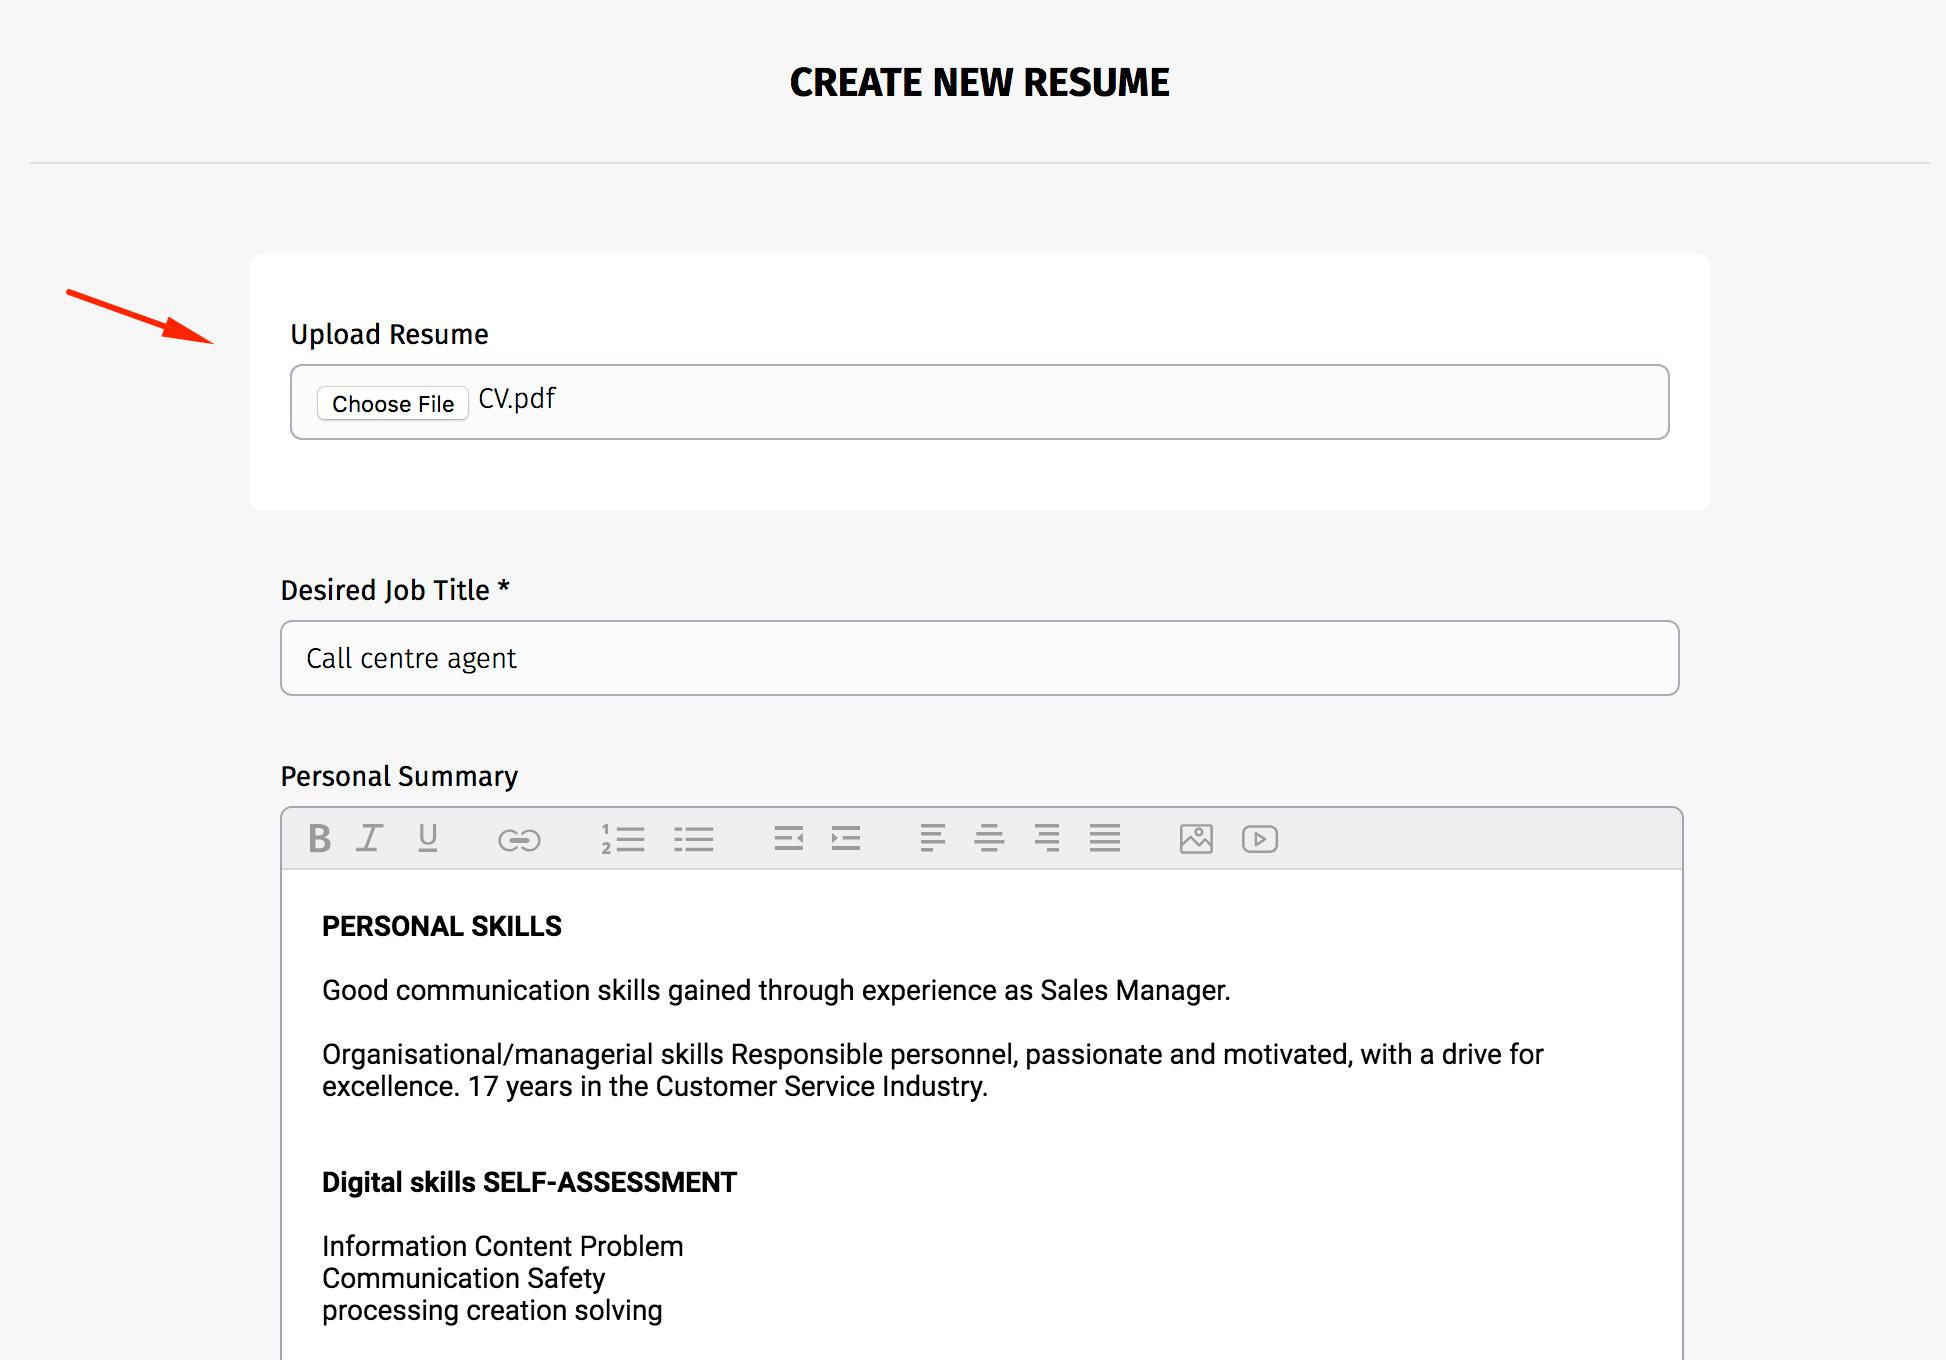 upload resume to update